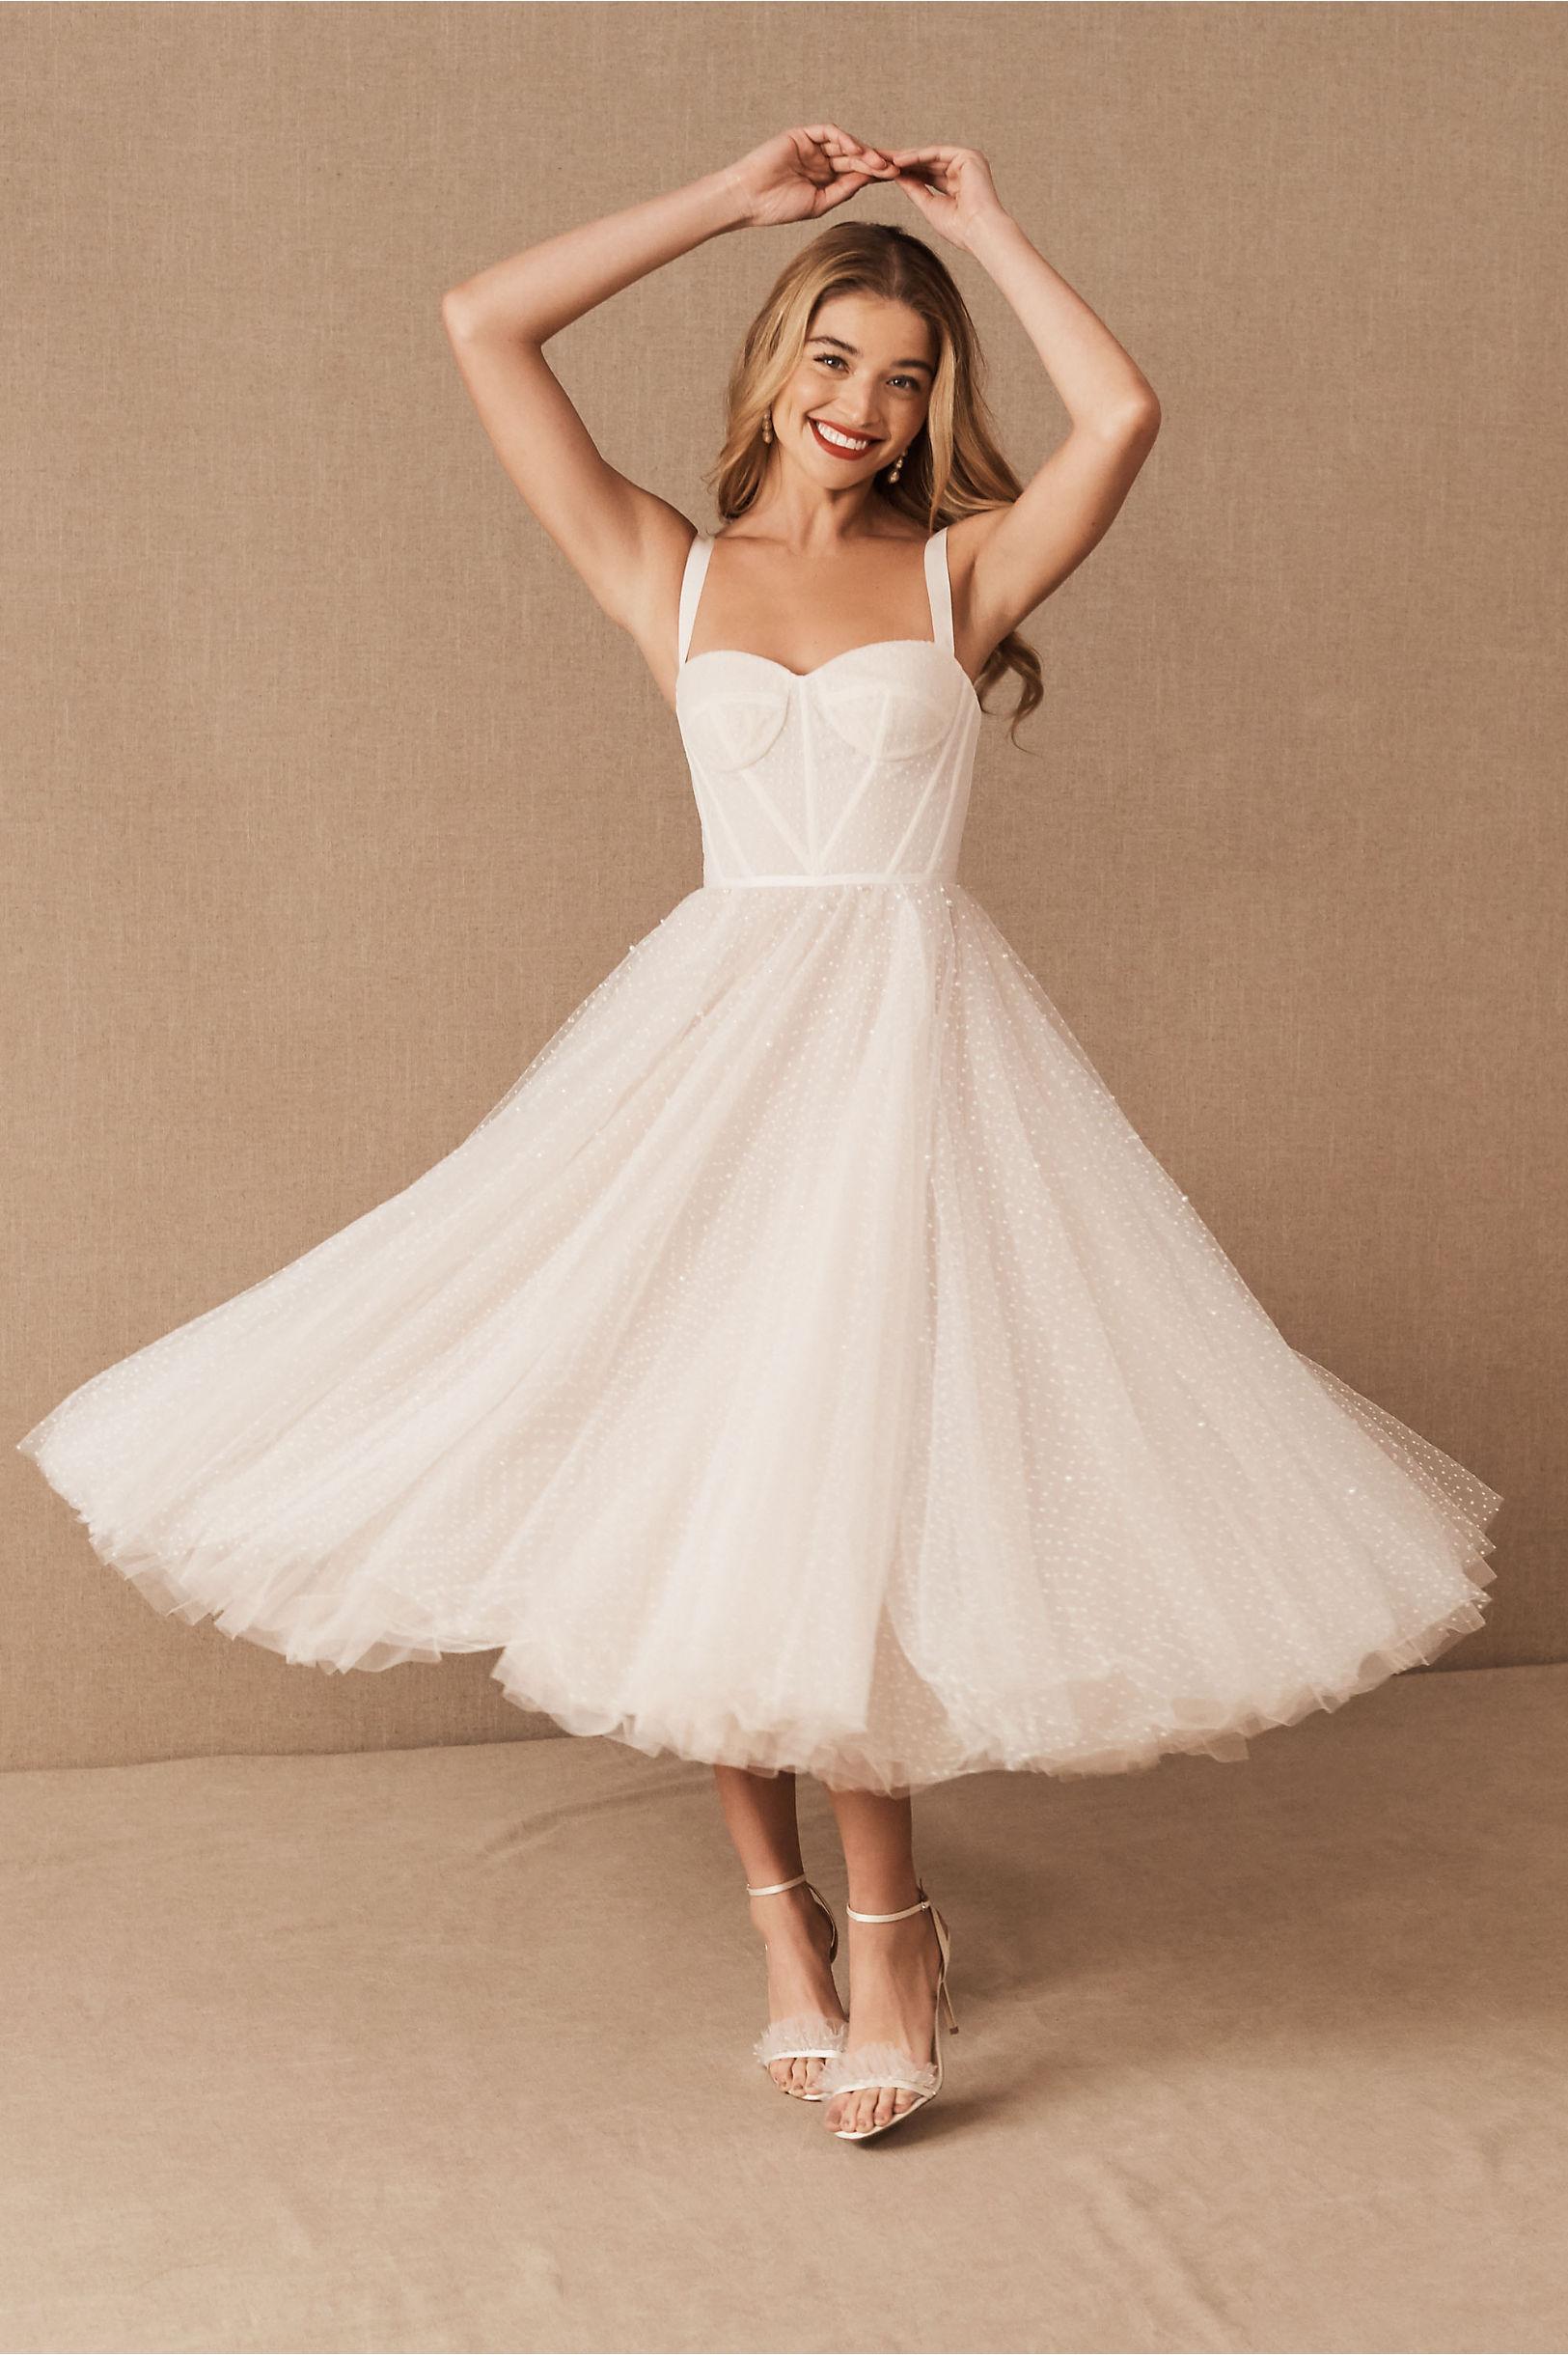 Top 10 Short Wedding Dresses Bridal Musings Wedding Blog